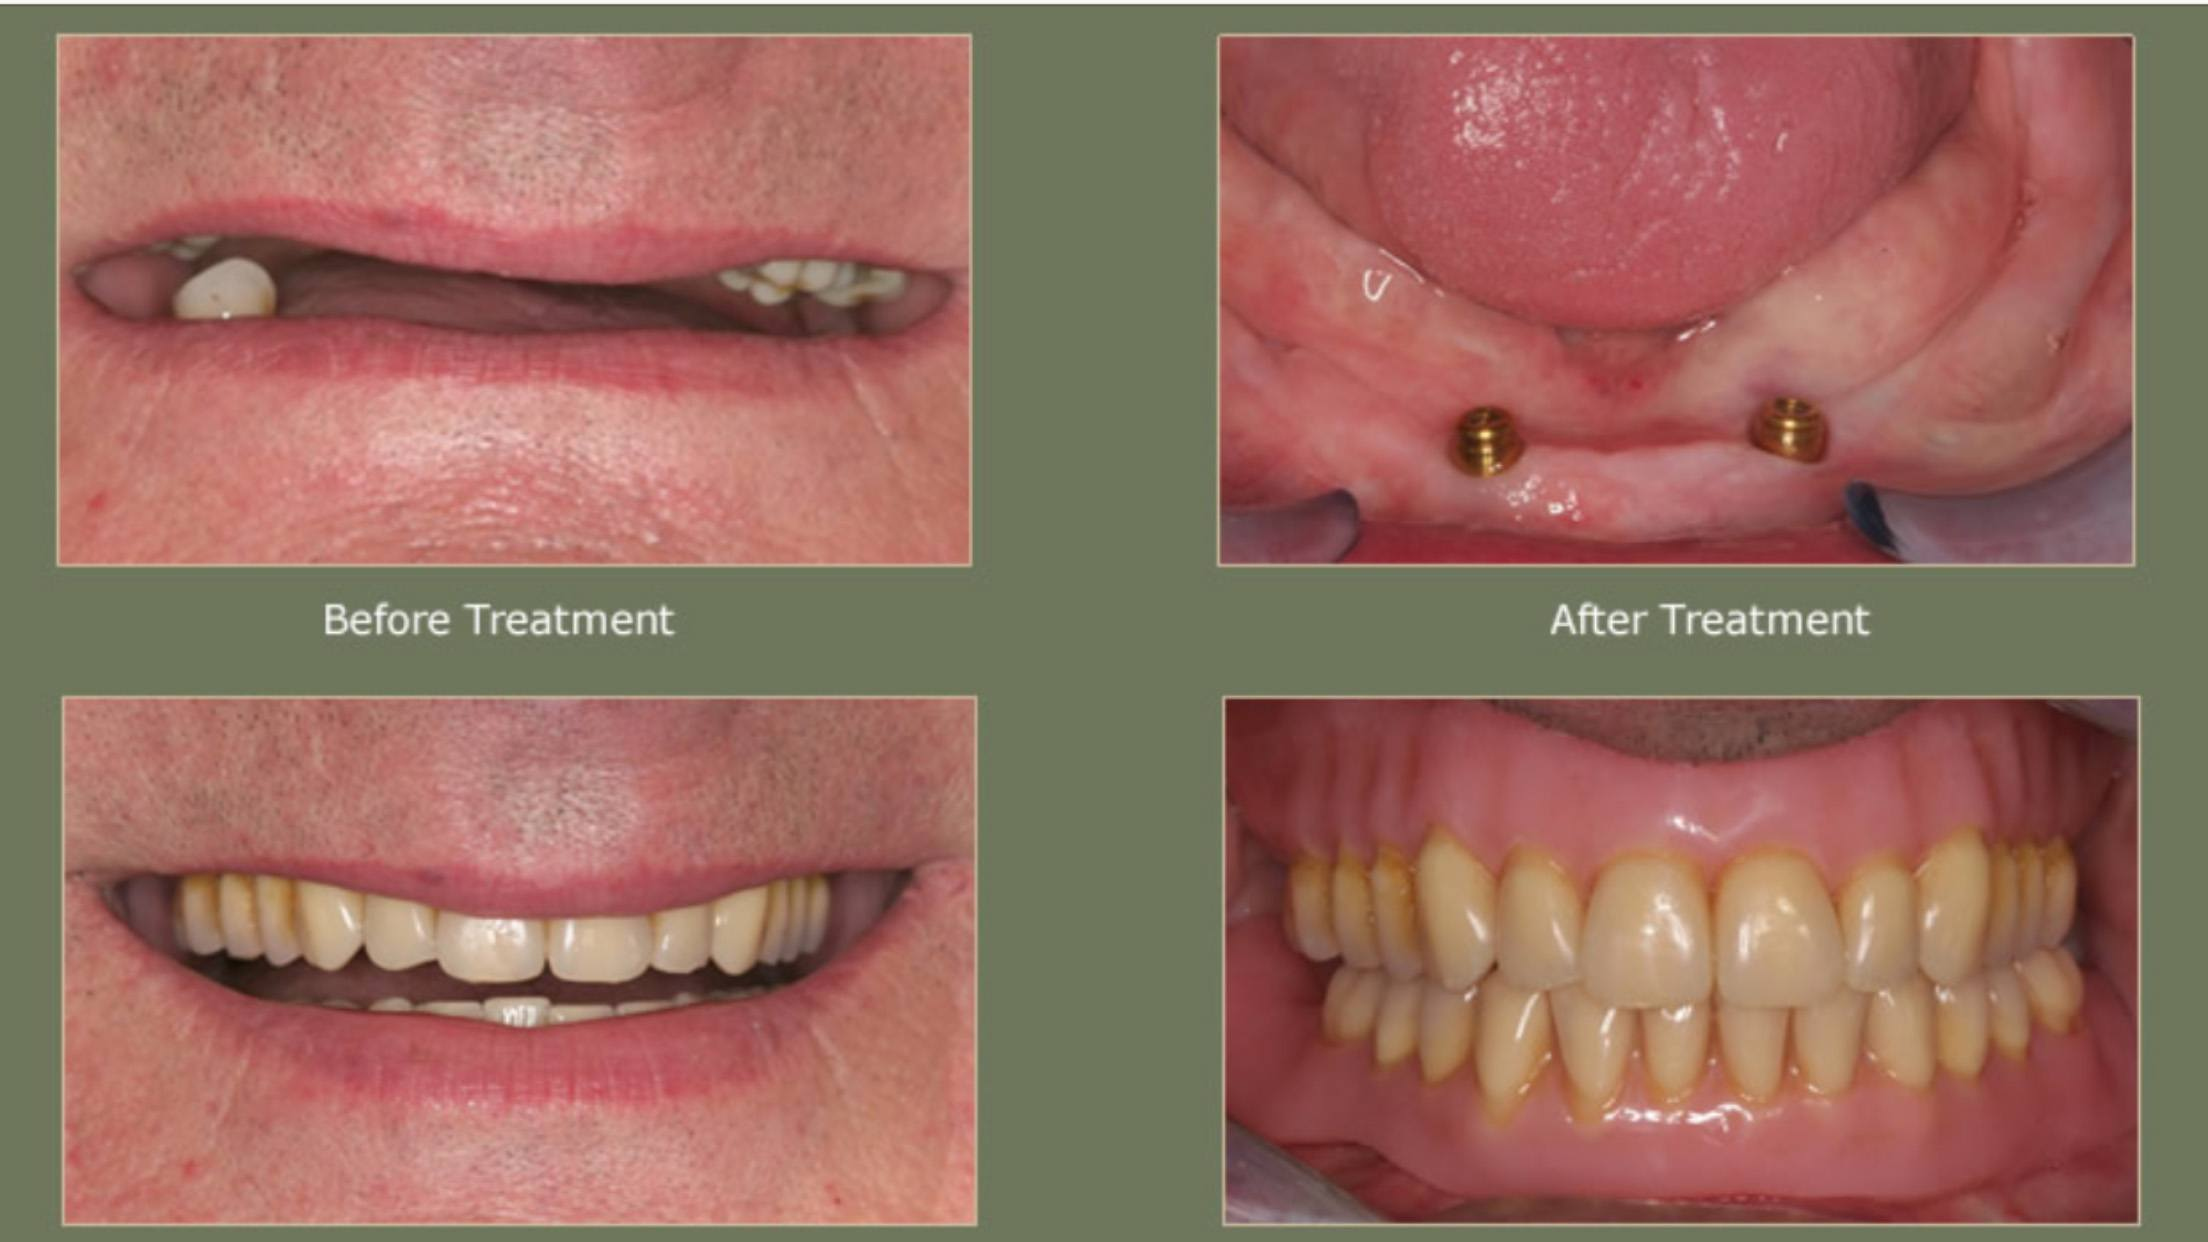 Examples of Dentures